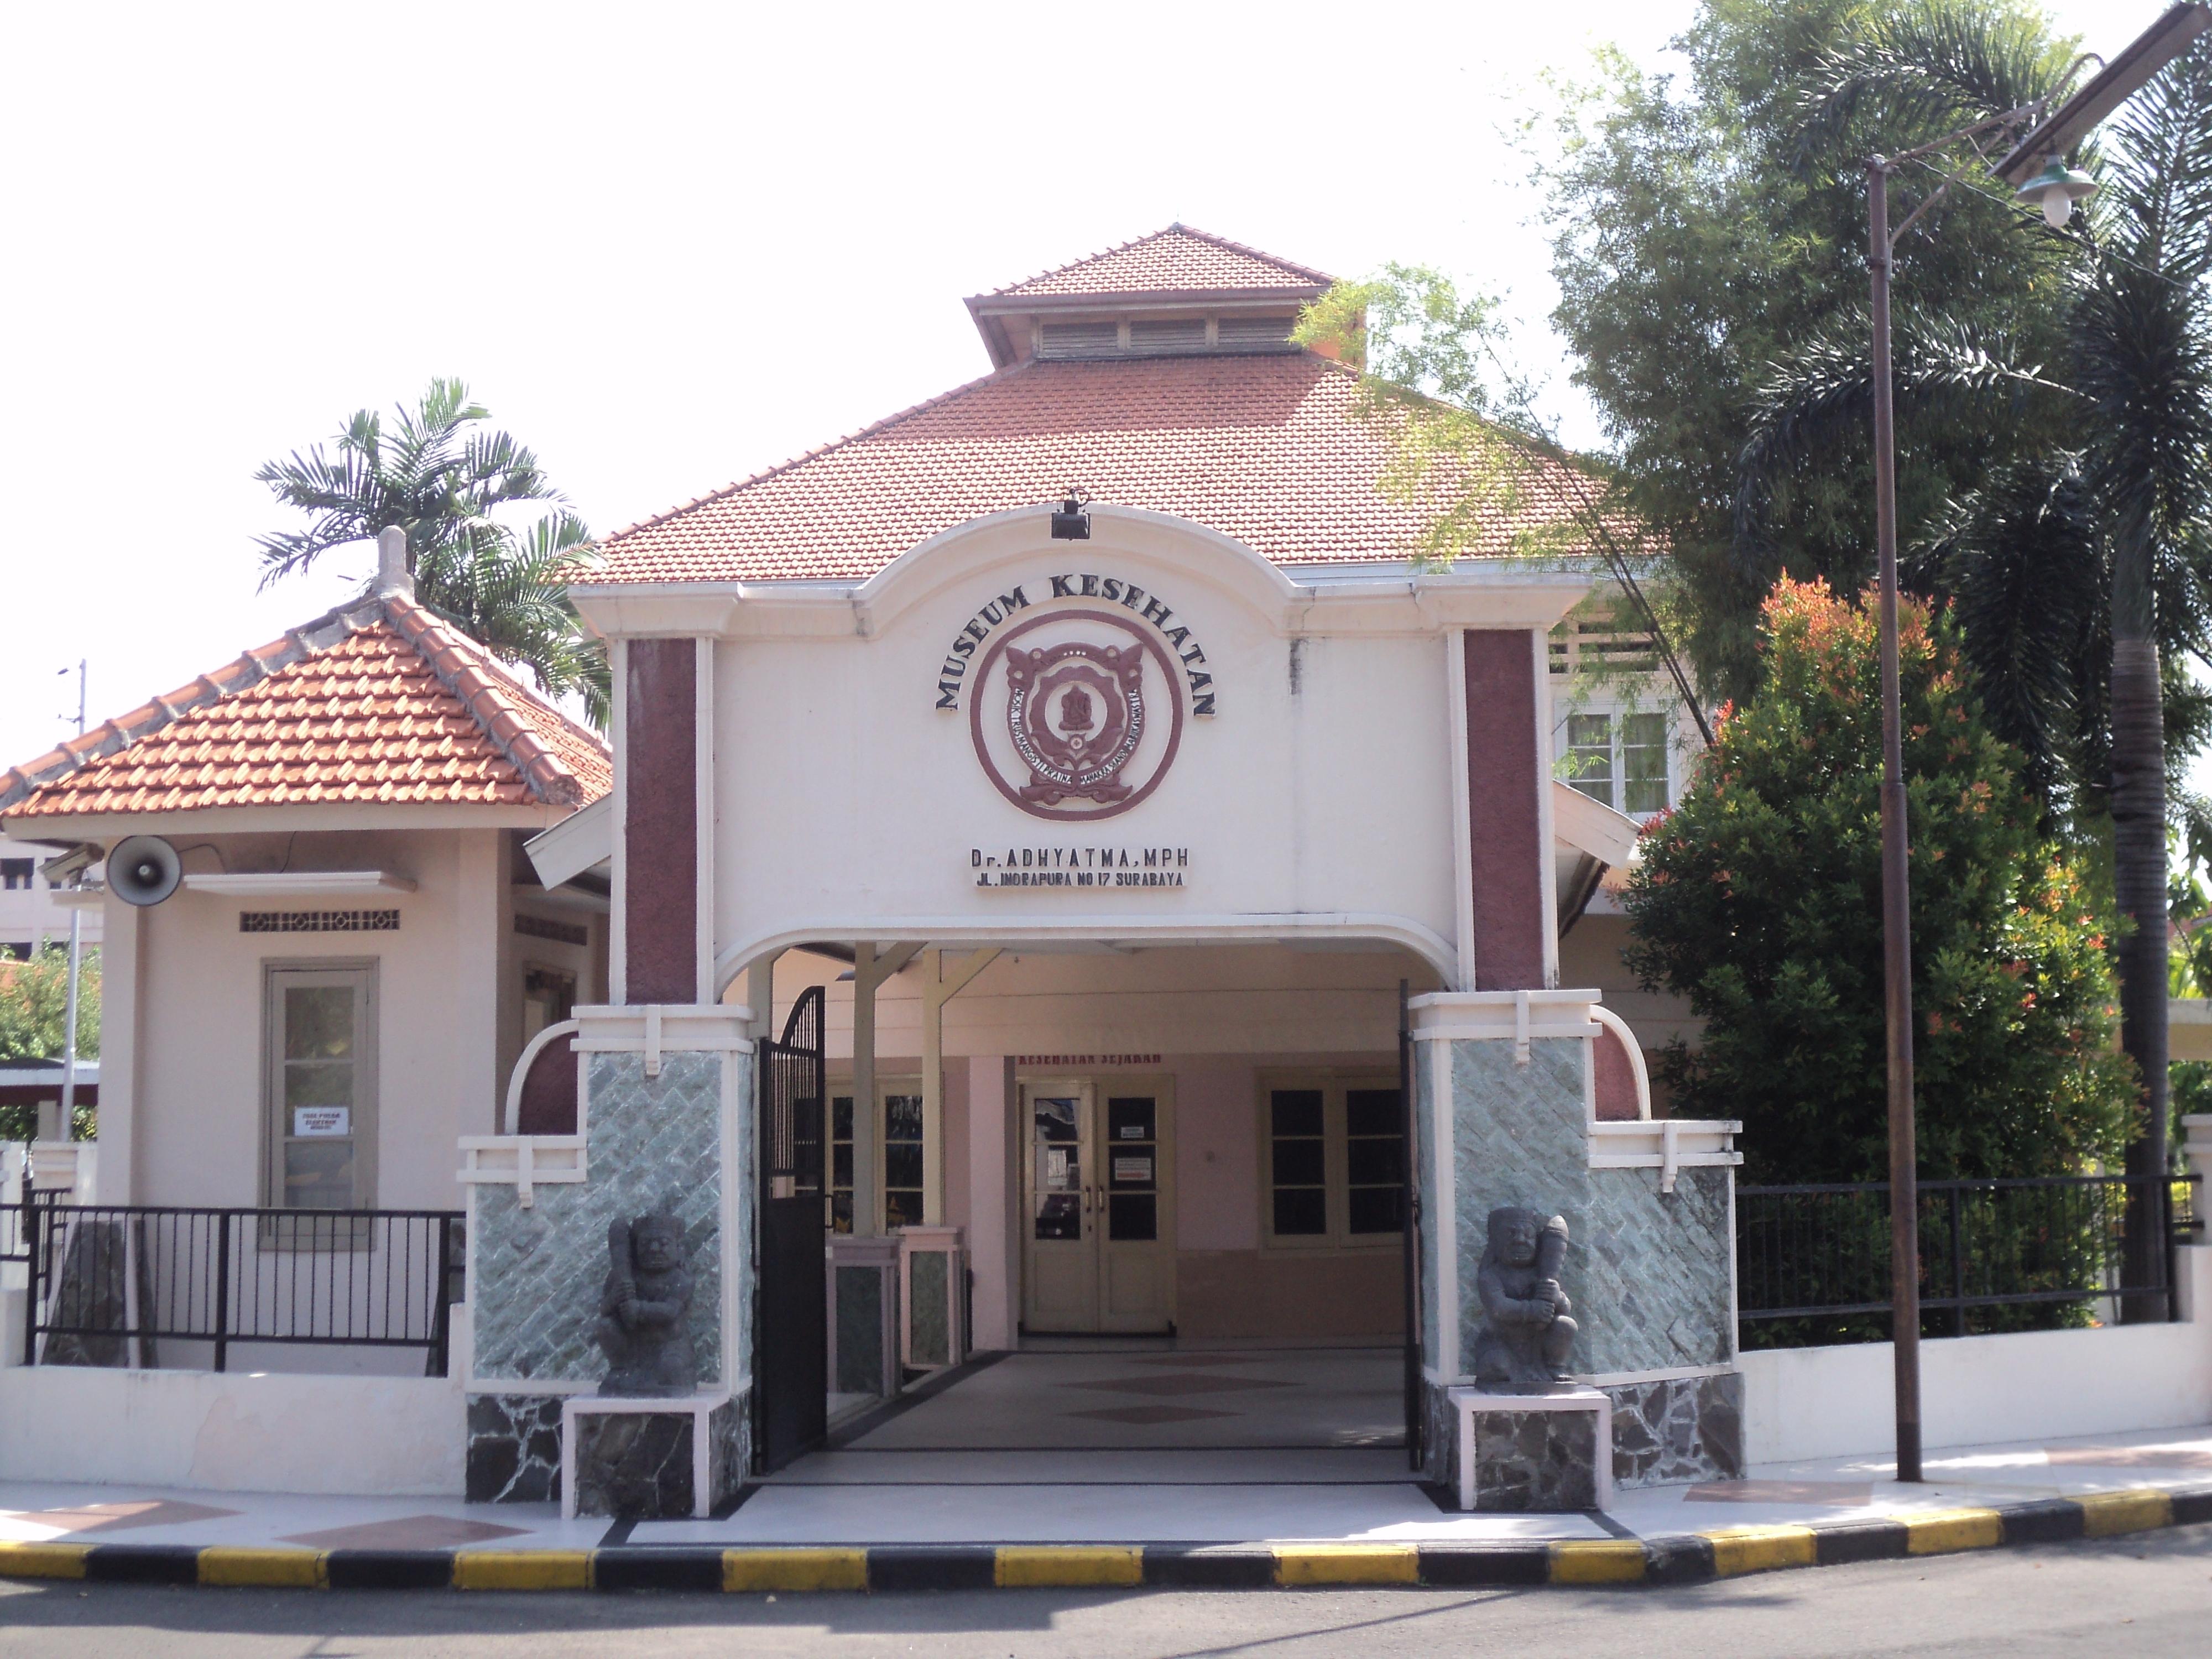 Museum Pesona Wisata Surabaya Kesehatan Wr Soepratman Kota